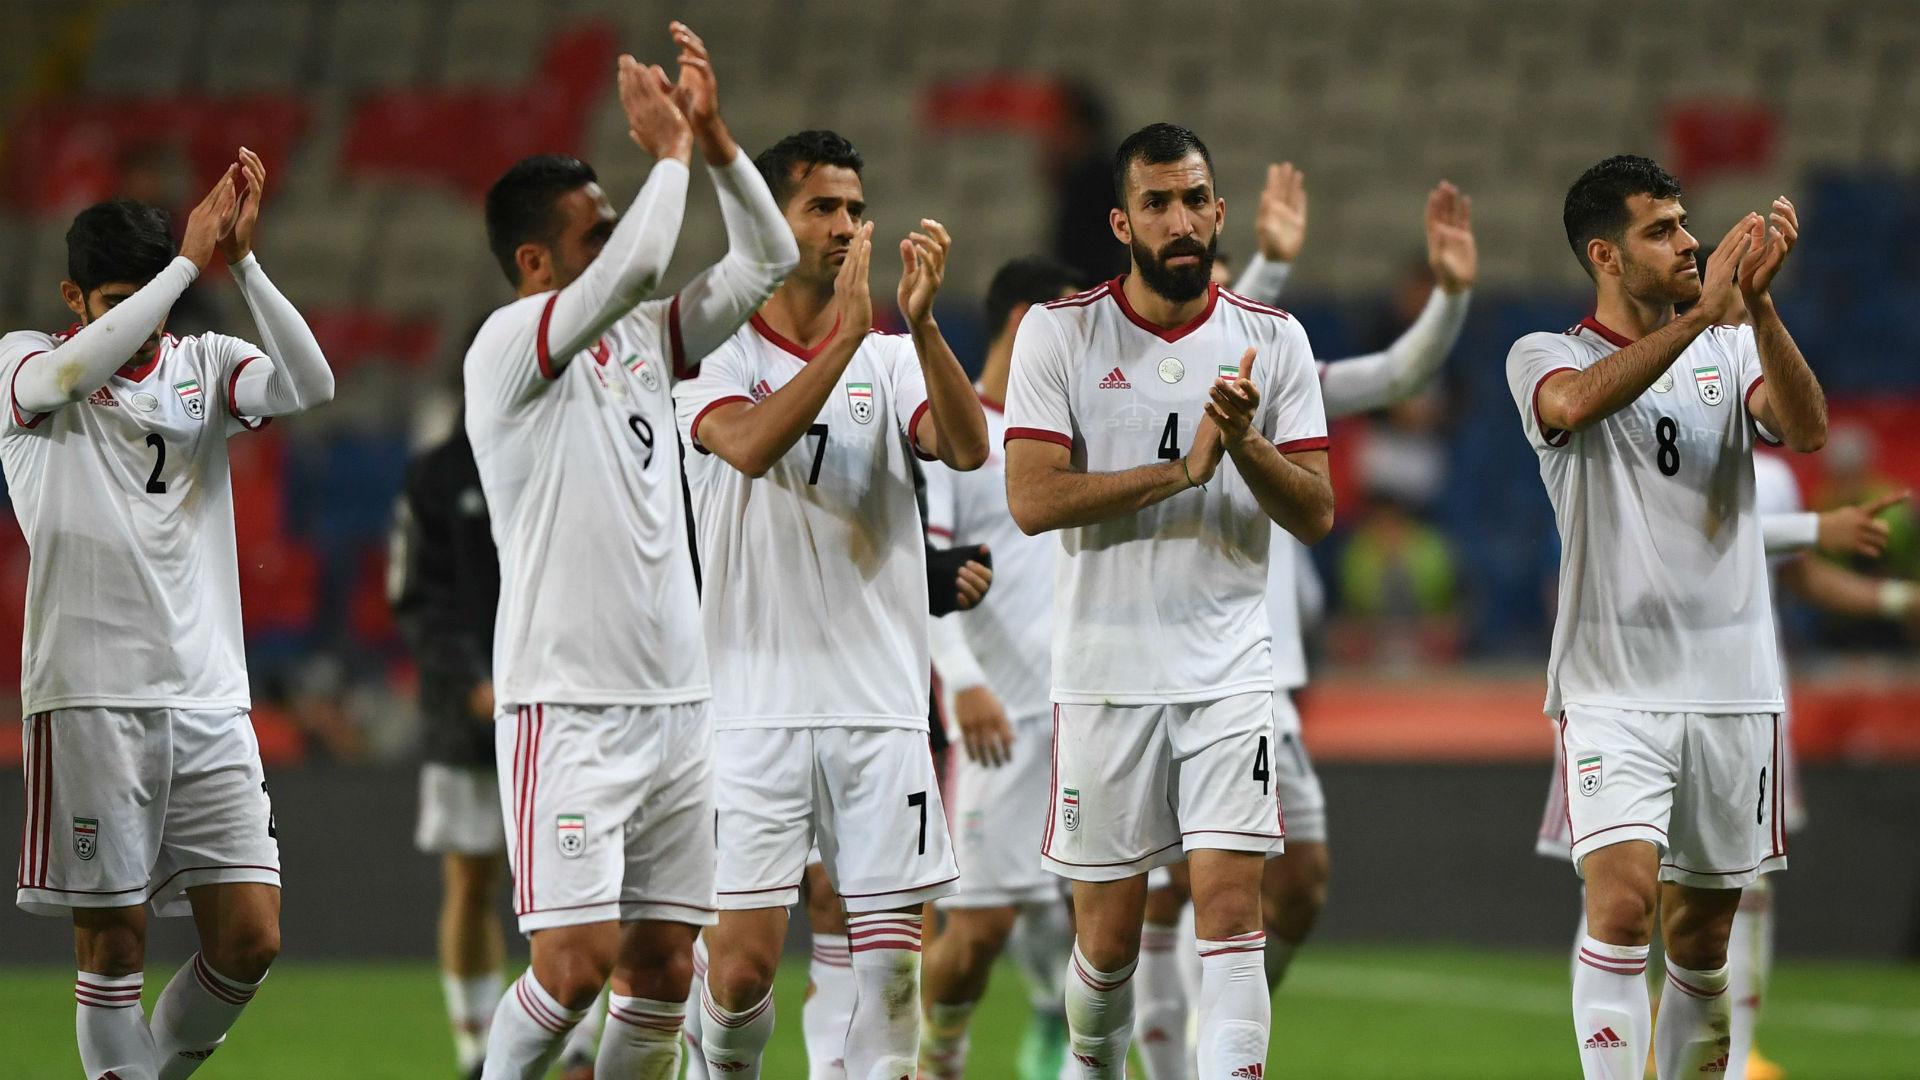 Irã amistoso 11 06 2018